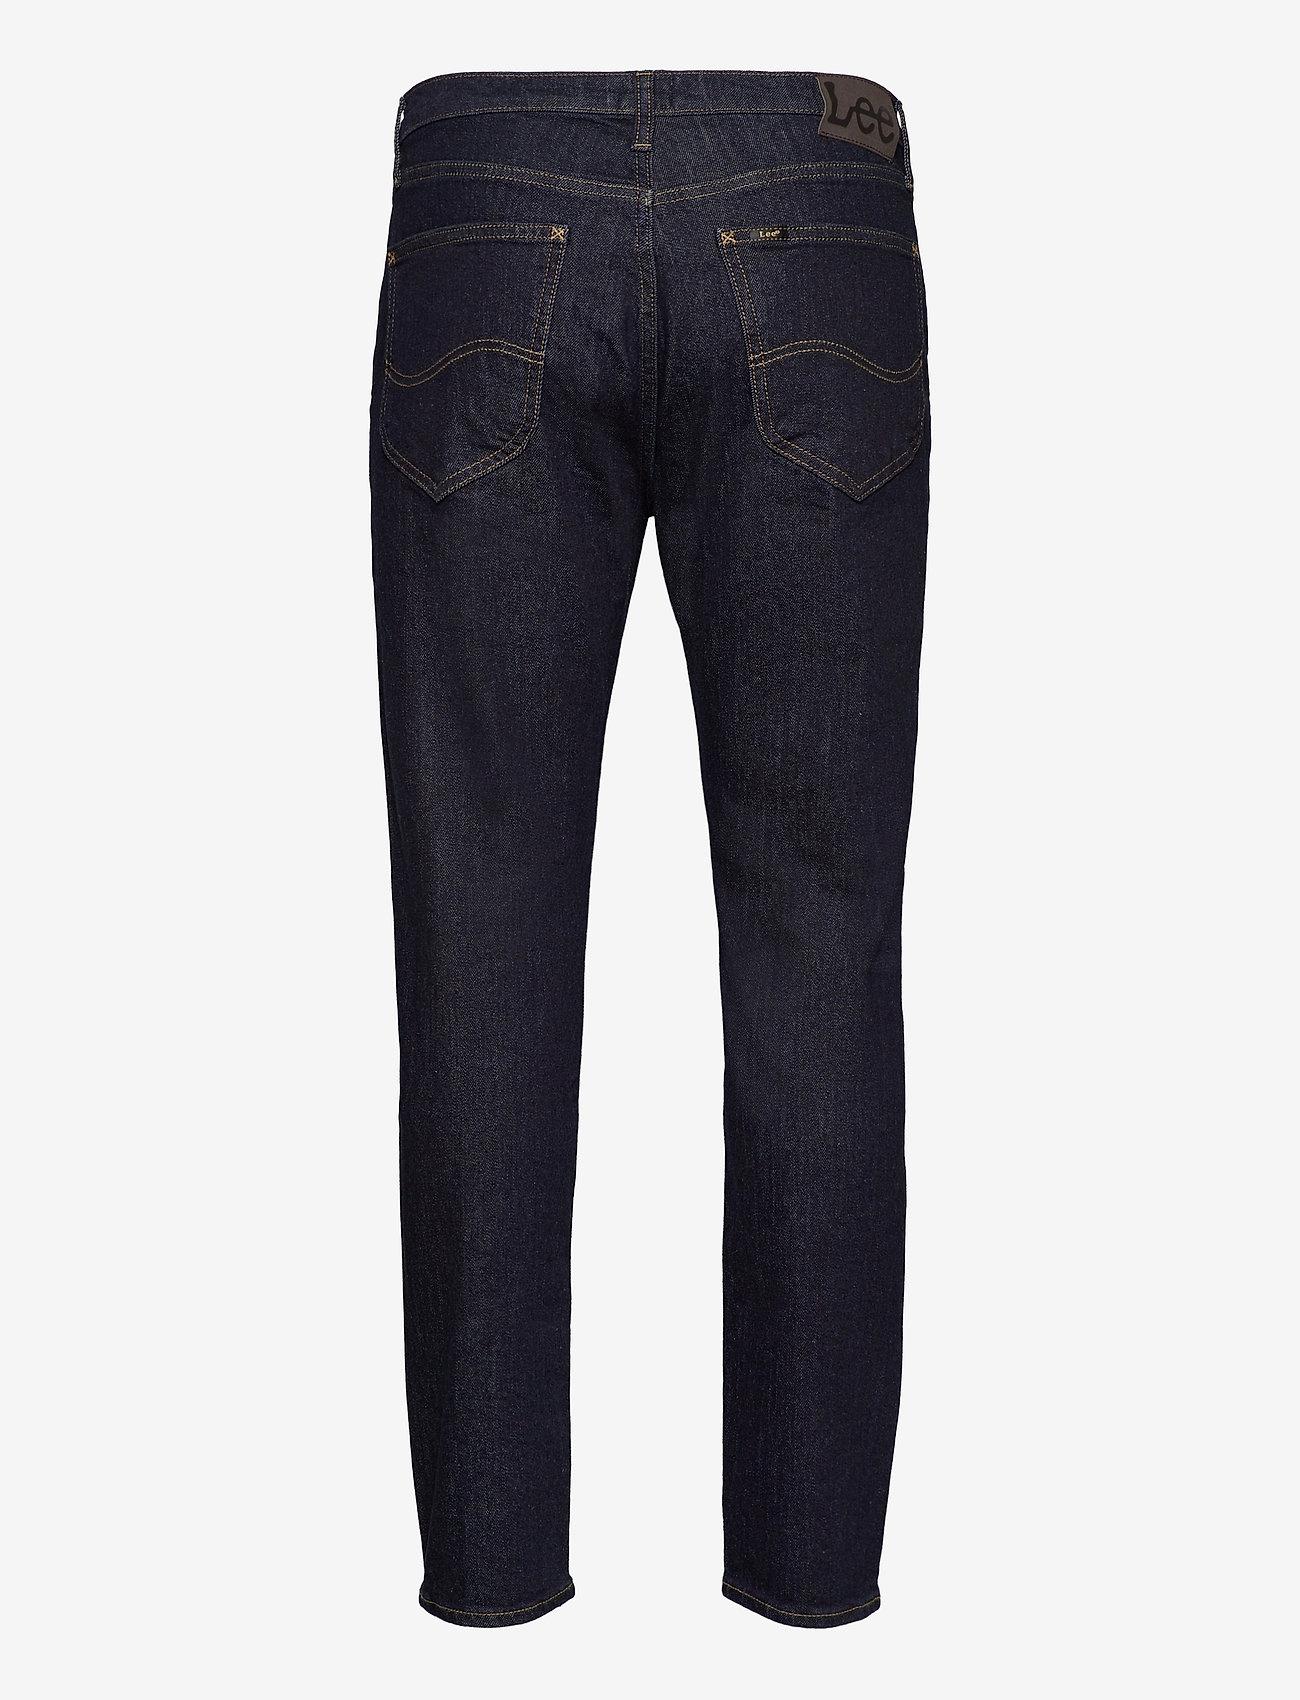 Lee Jeans - AUSTIN - regular jeans - rinse - 1